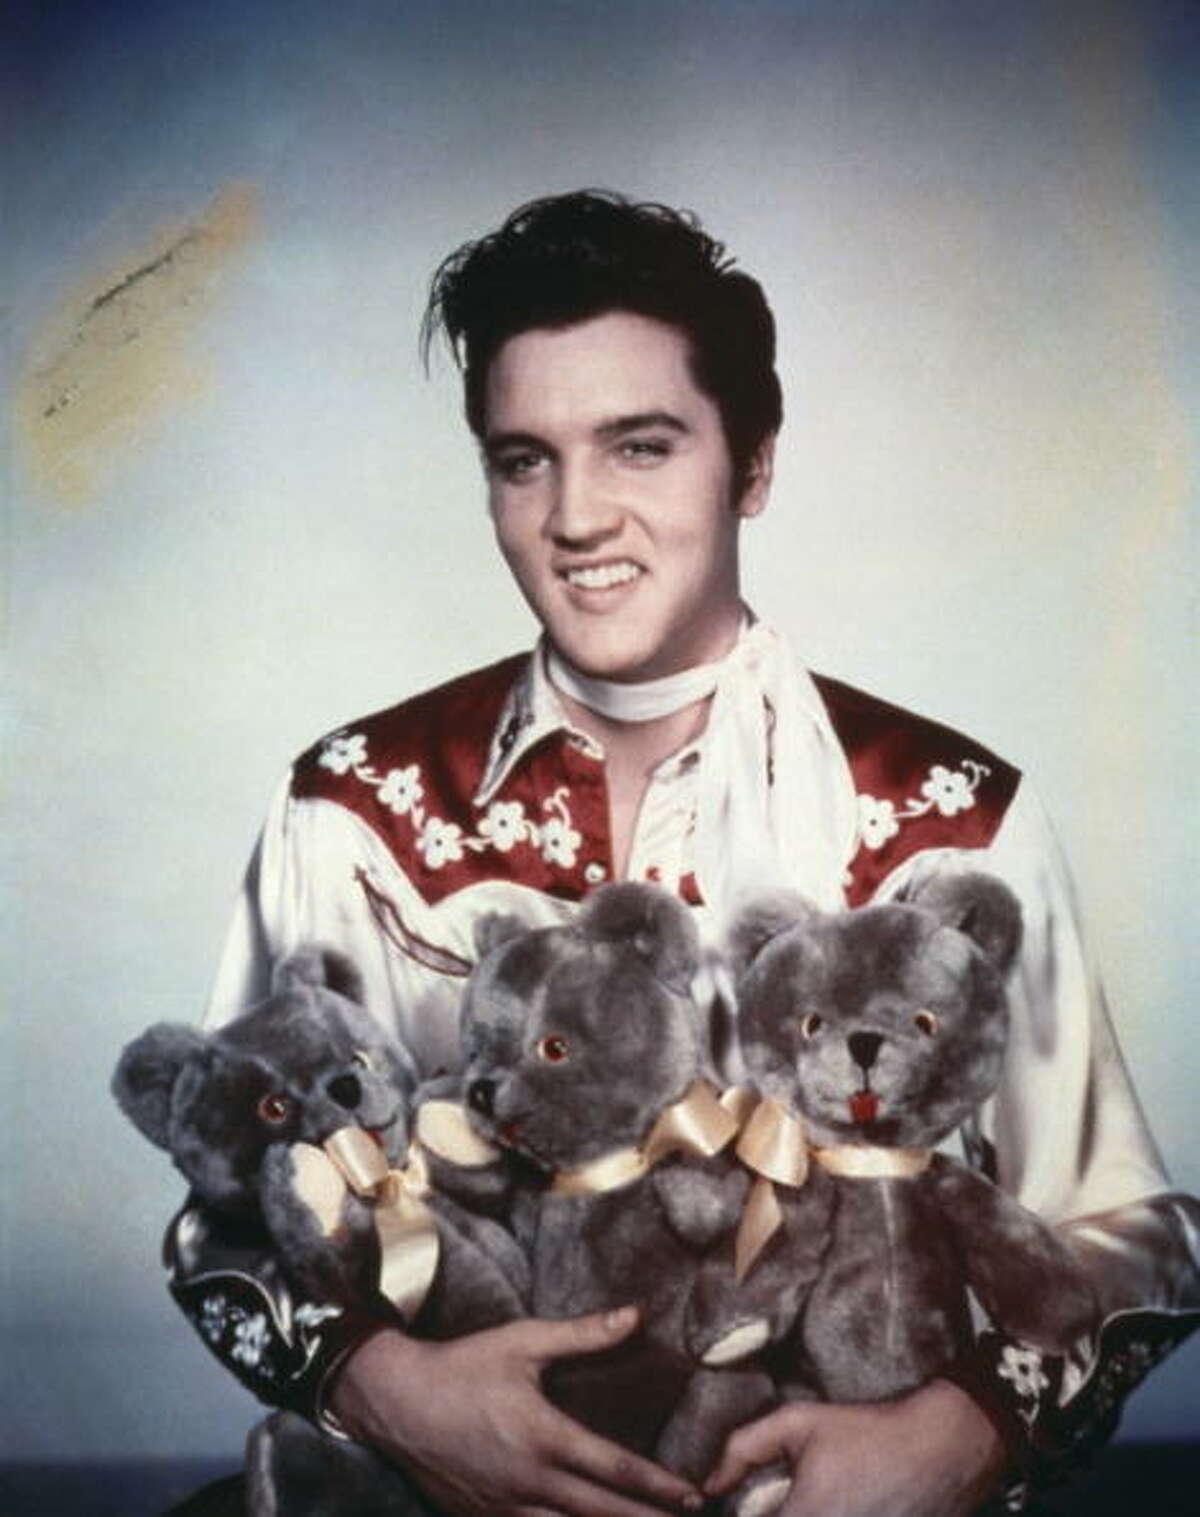 Celebs who believe in UFOs: Elvis Presley